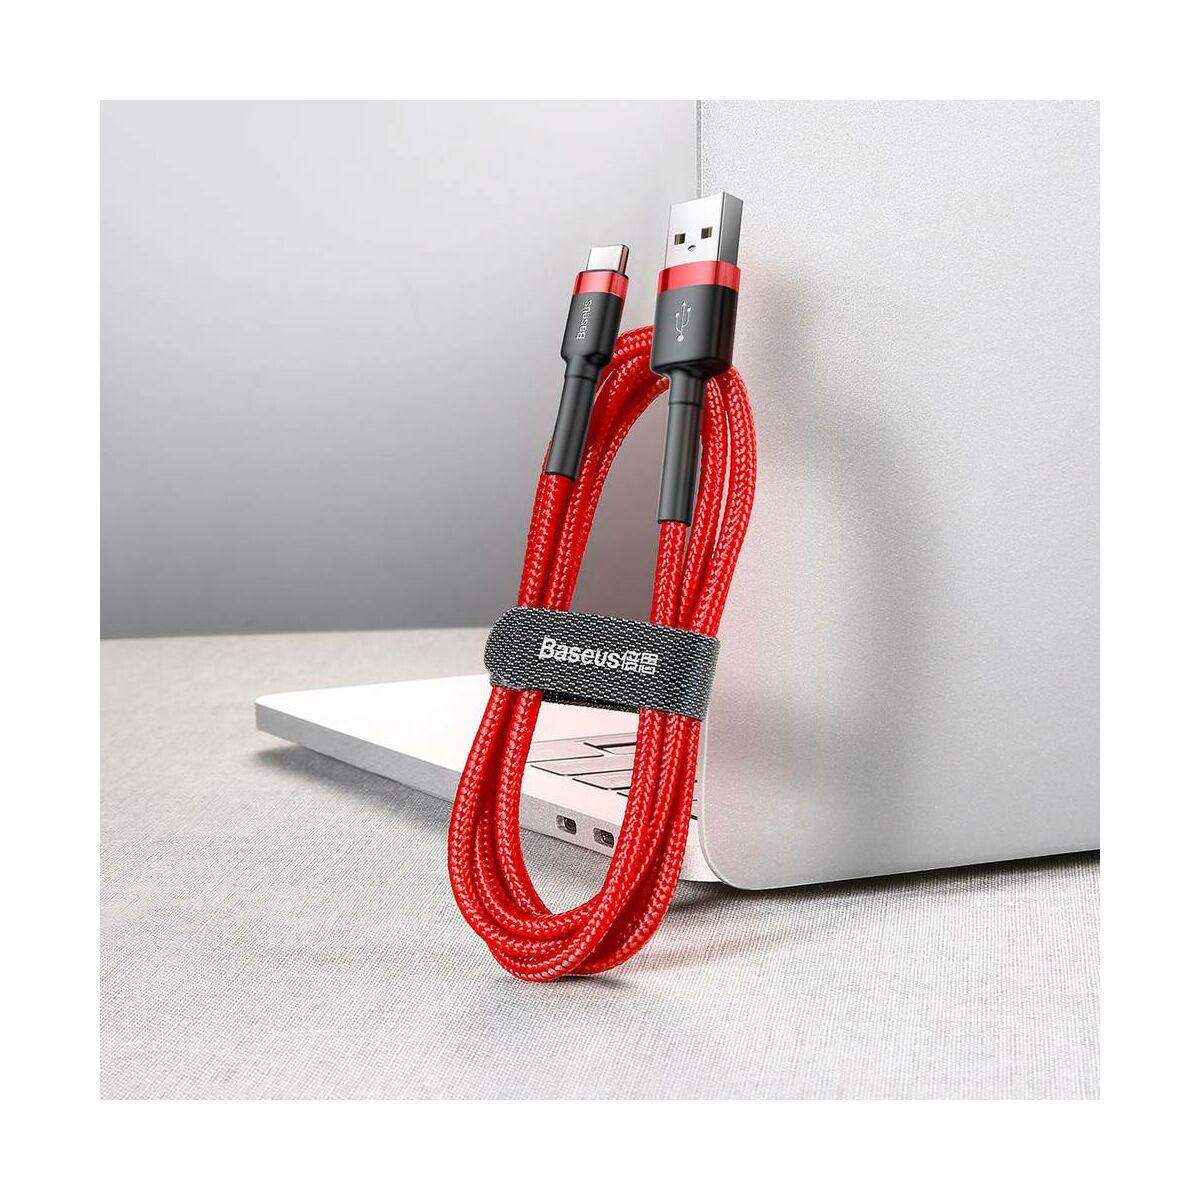 Baseus Type-C kábel, Cafule, 2A, 2m, piros/piros (CATKLF-C kábel,09)